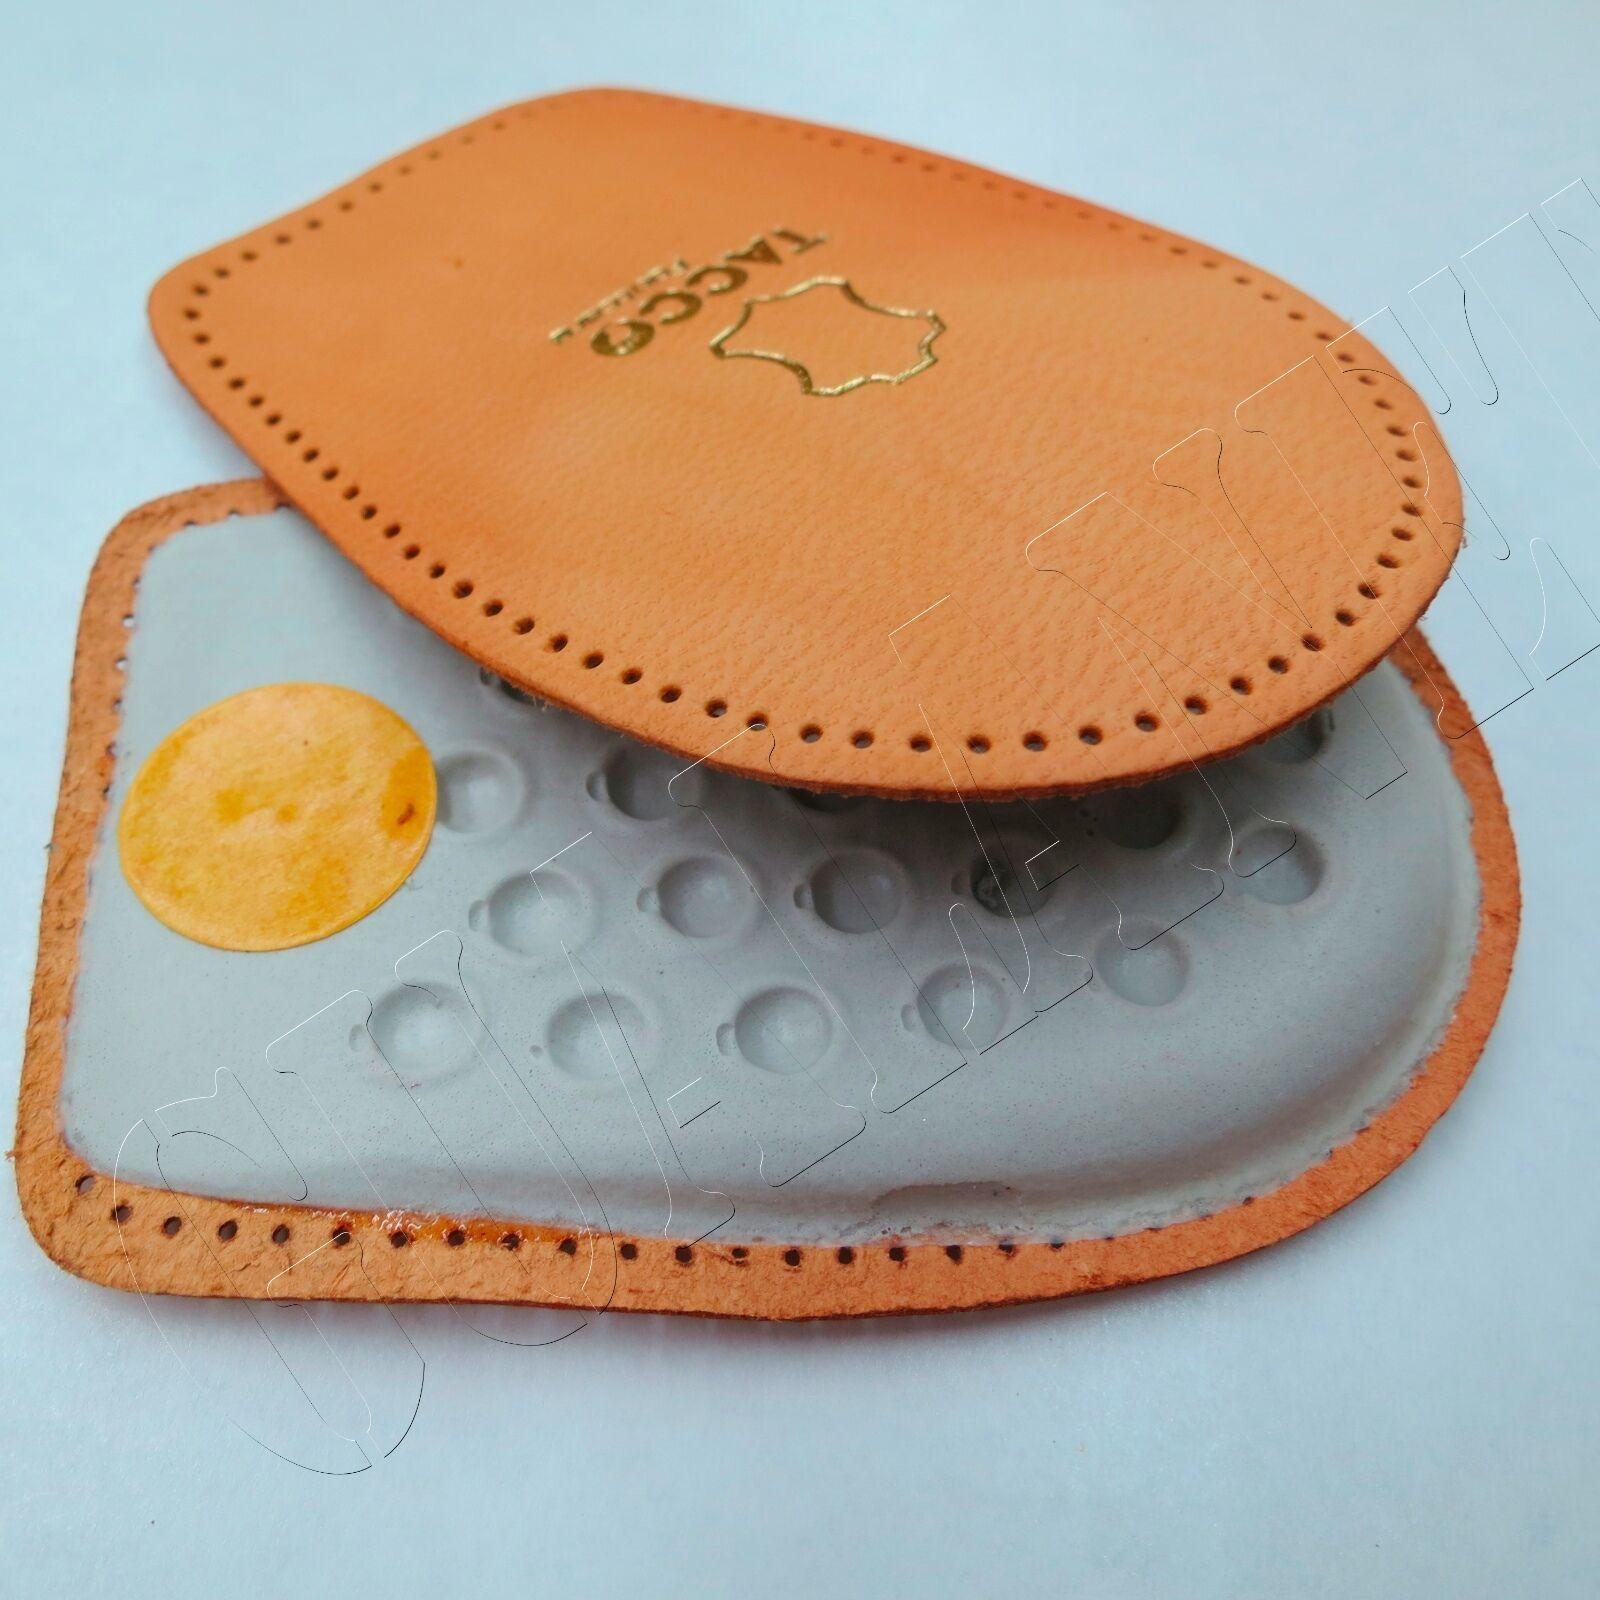 ALL SIZES Tacco 648 Woody Comfort Cushion Shoe Inserts Soft Latex Foam Insoles